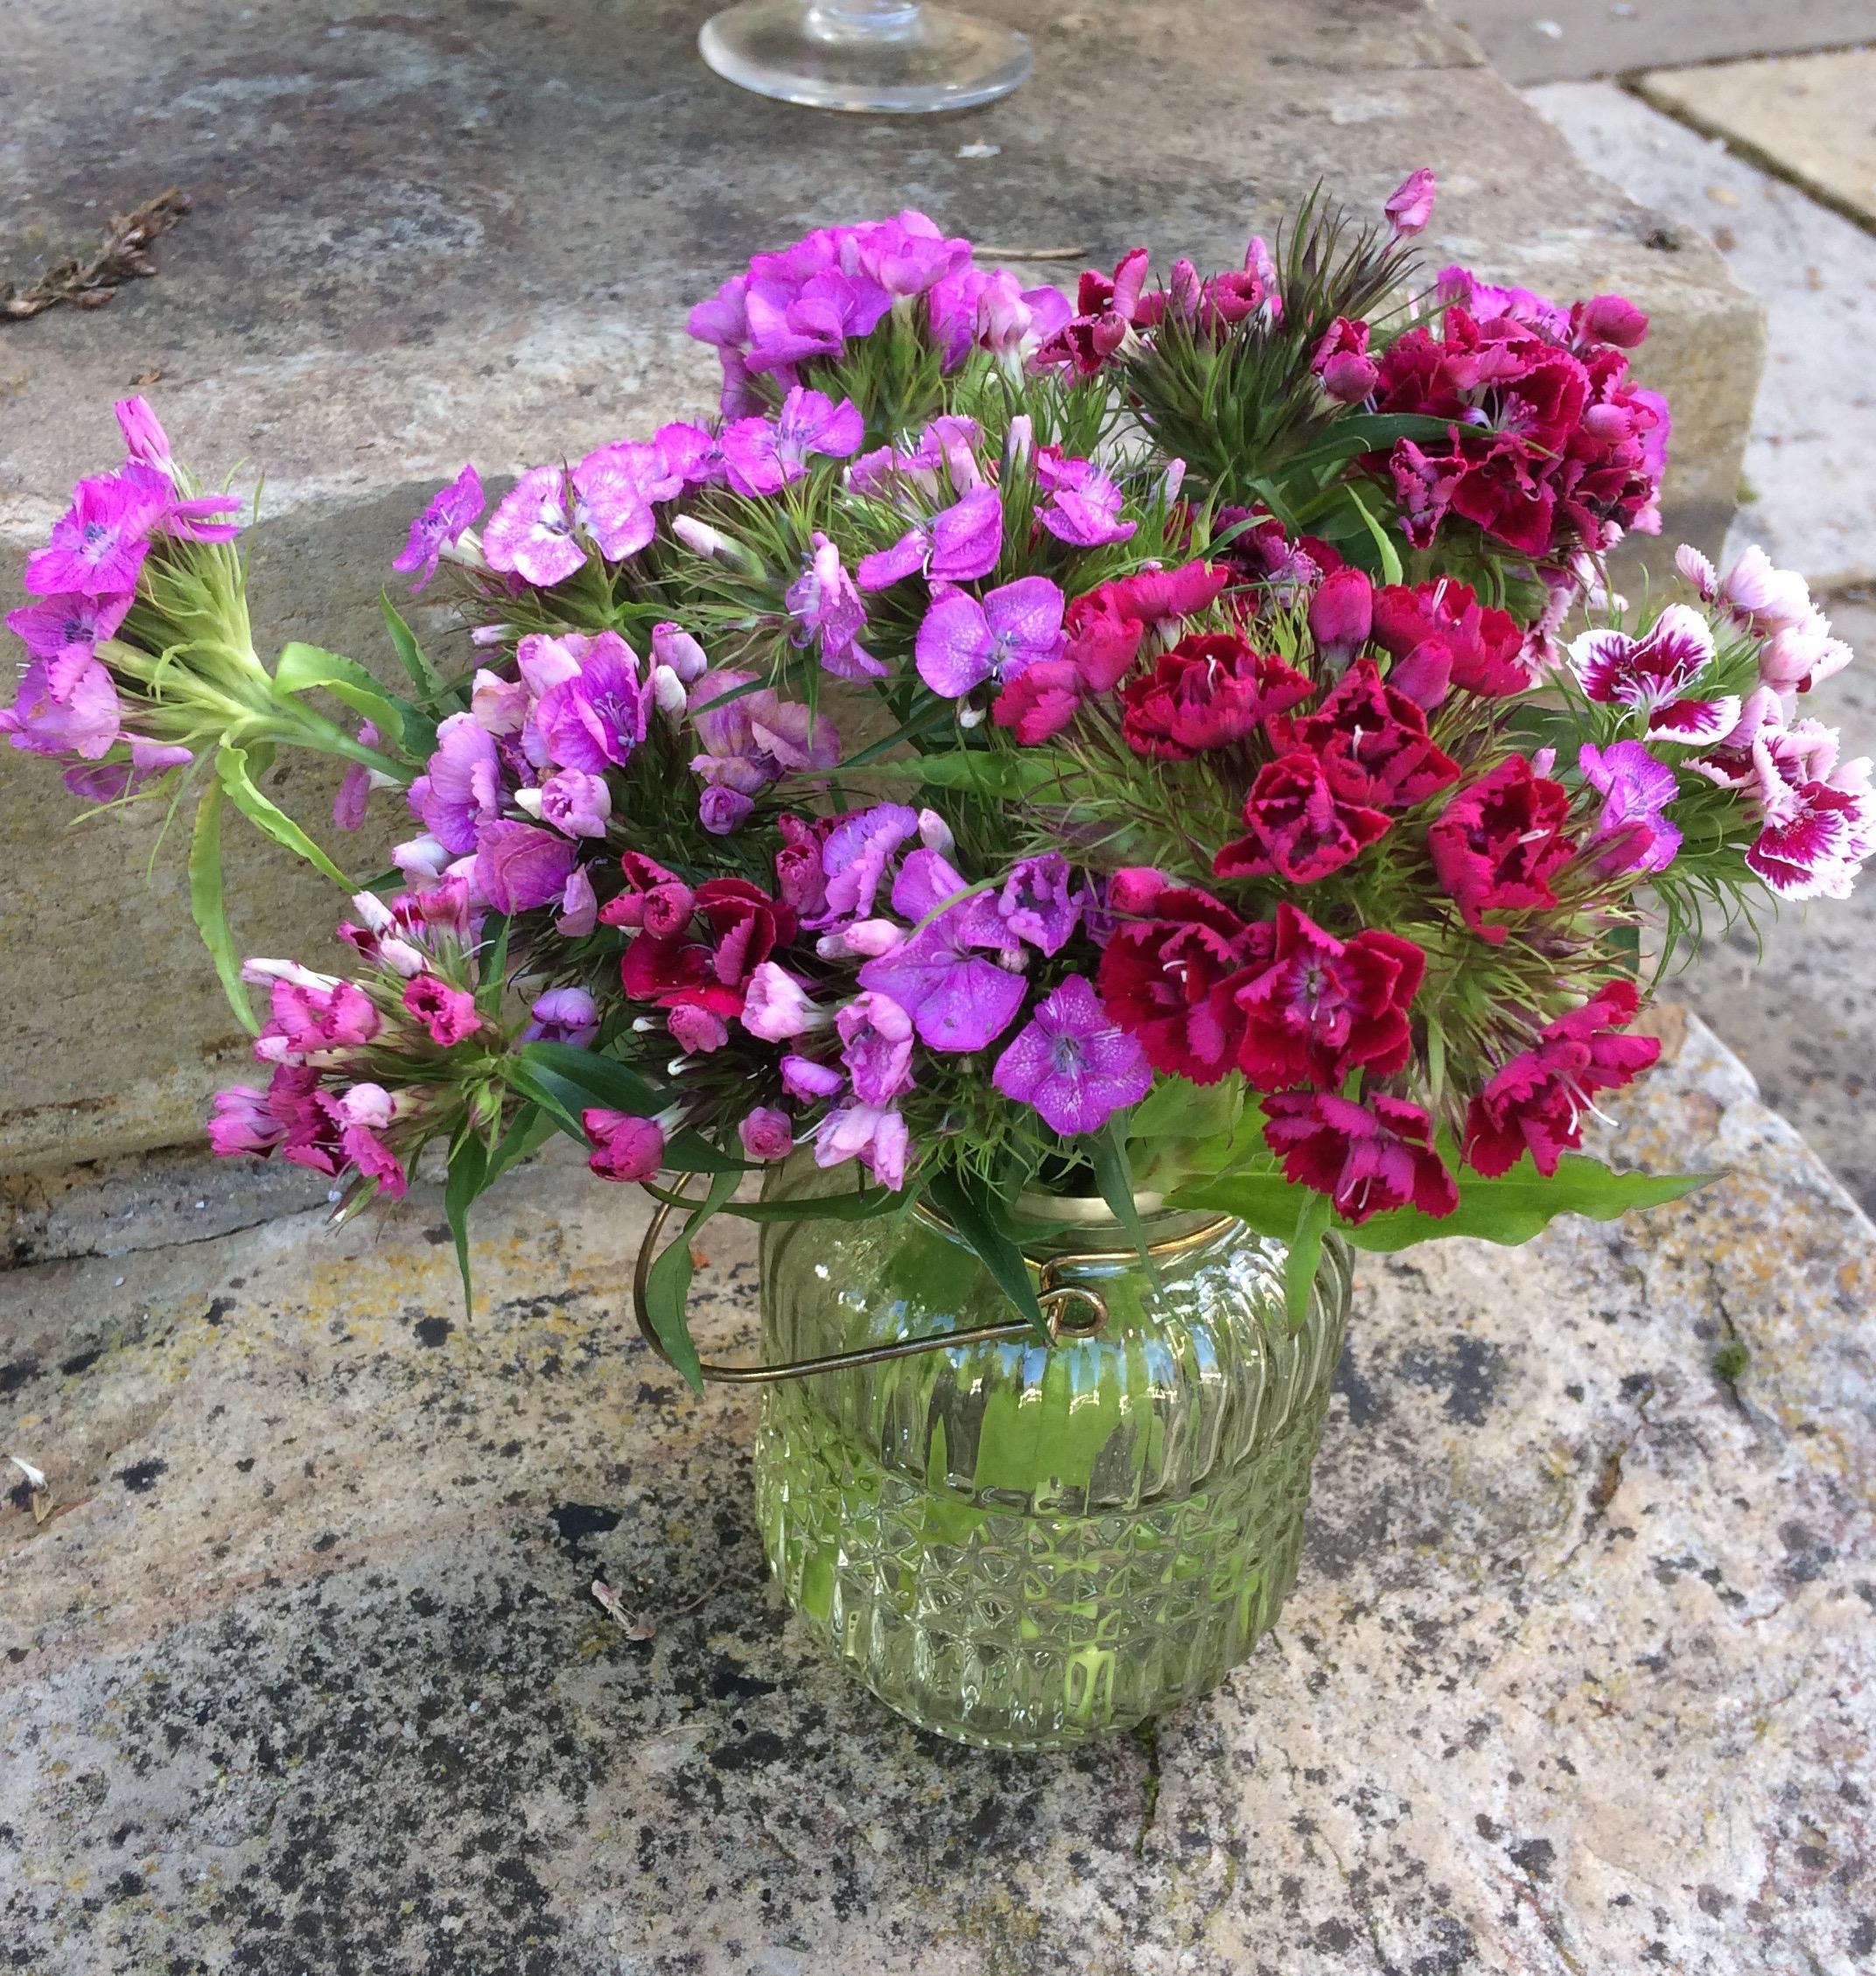 June Wedding Flower Bouquets: Wedding Flower Ideas - Bettie Rose